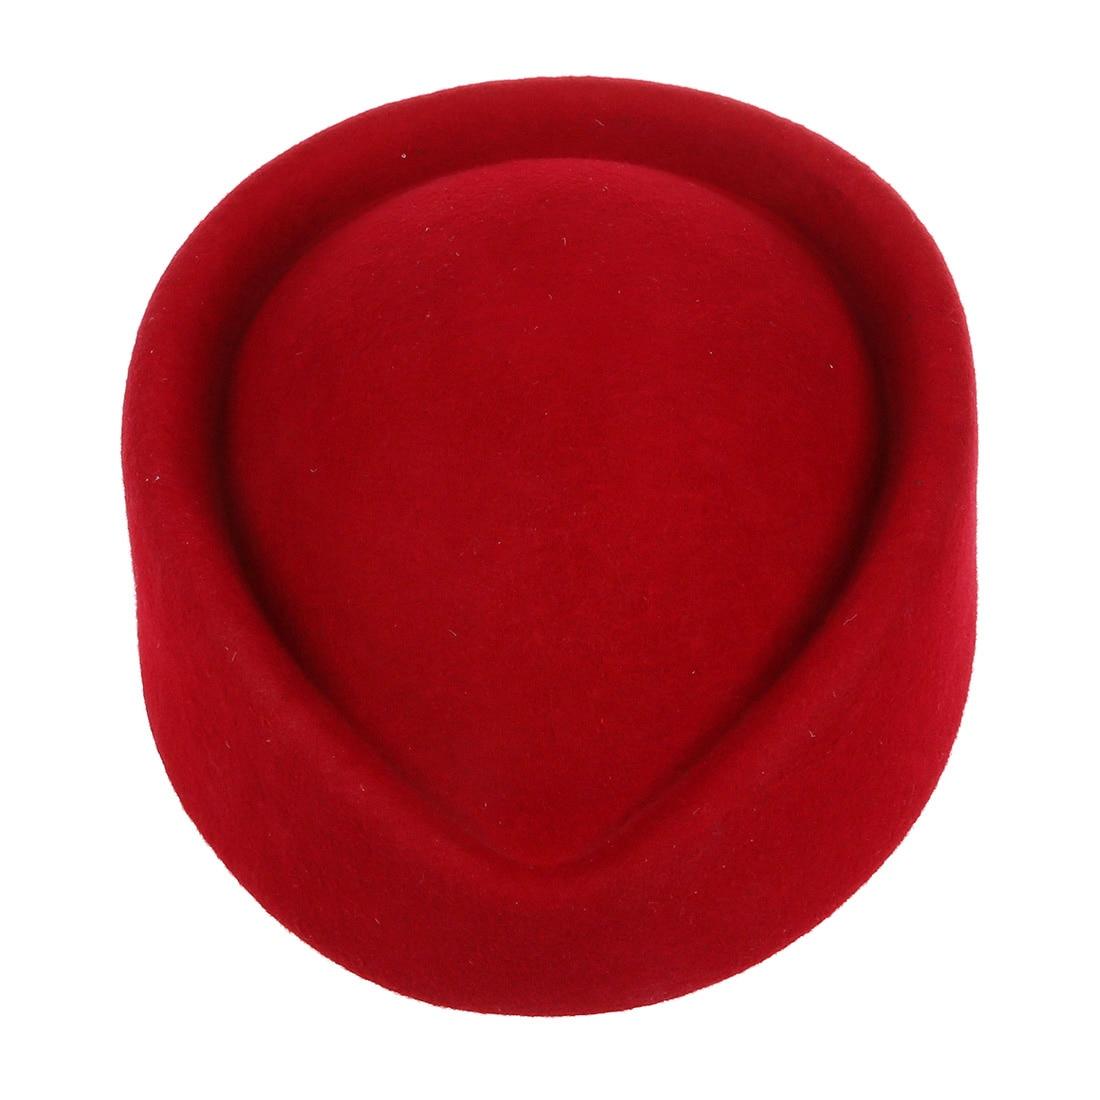 Negro Steampunk sombrero lana sombreros para mujer loco sombrerero sombrero  caballero británico hombres sombreros magia mago 2037134a37b